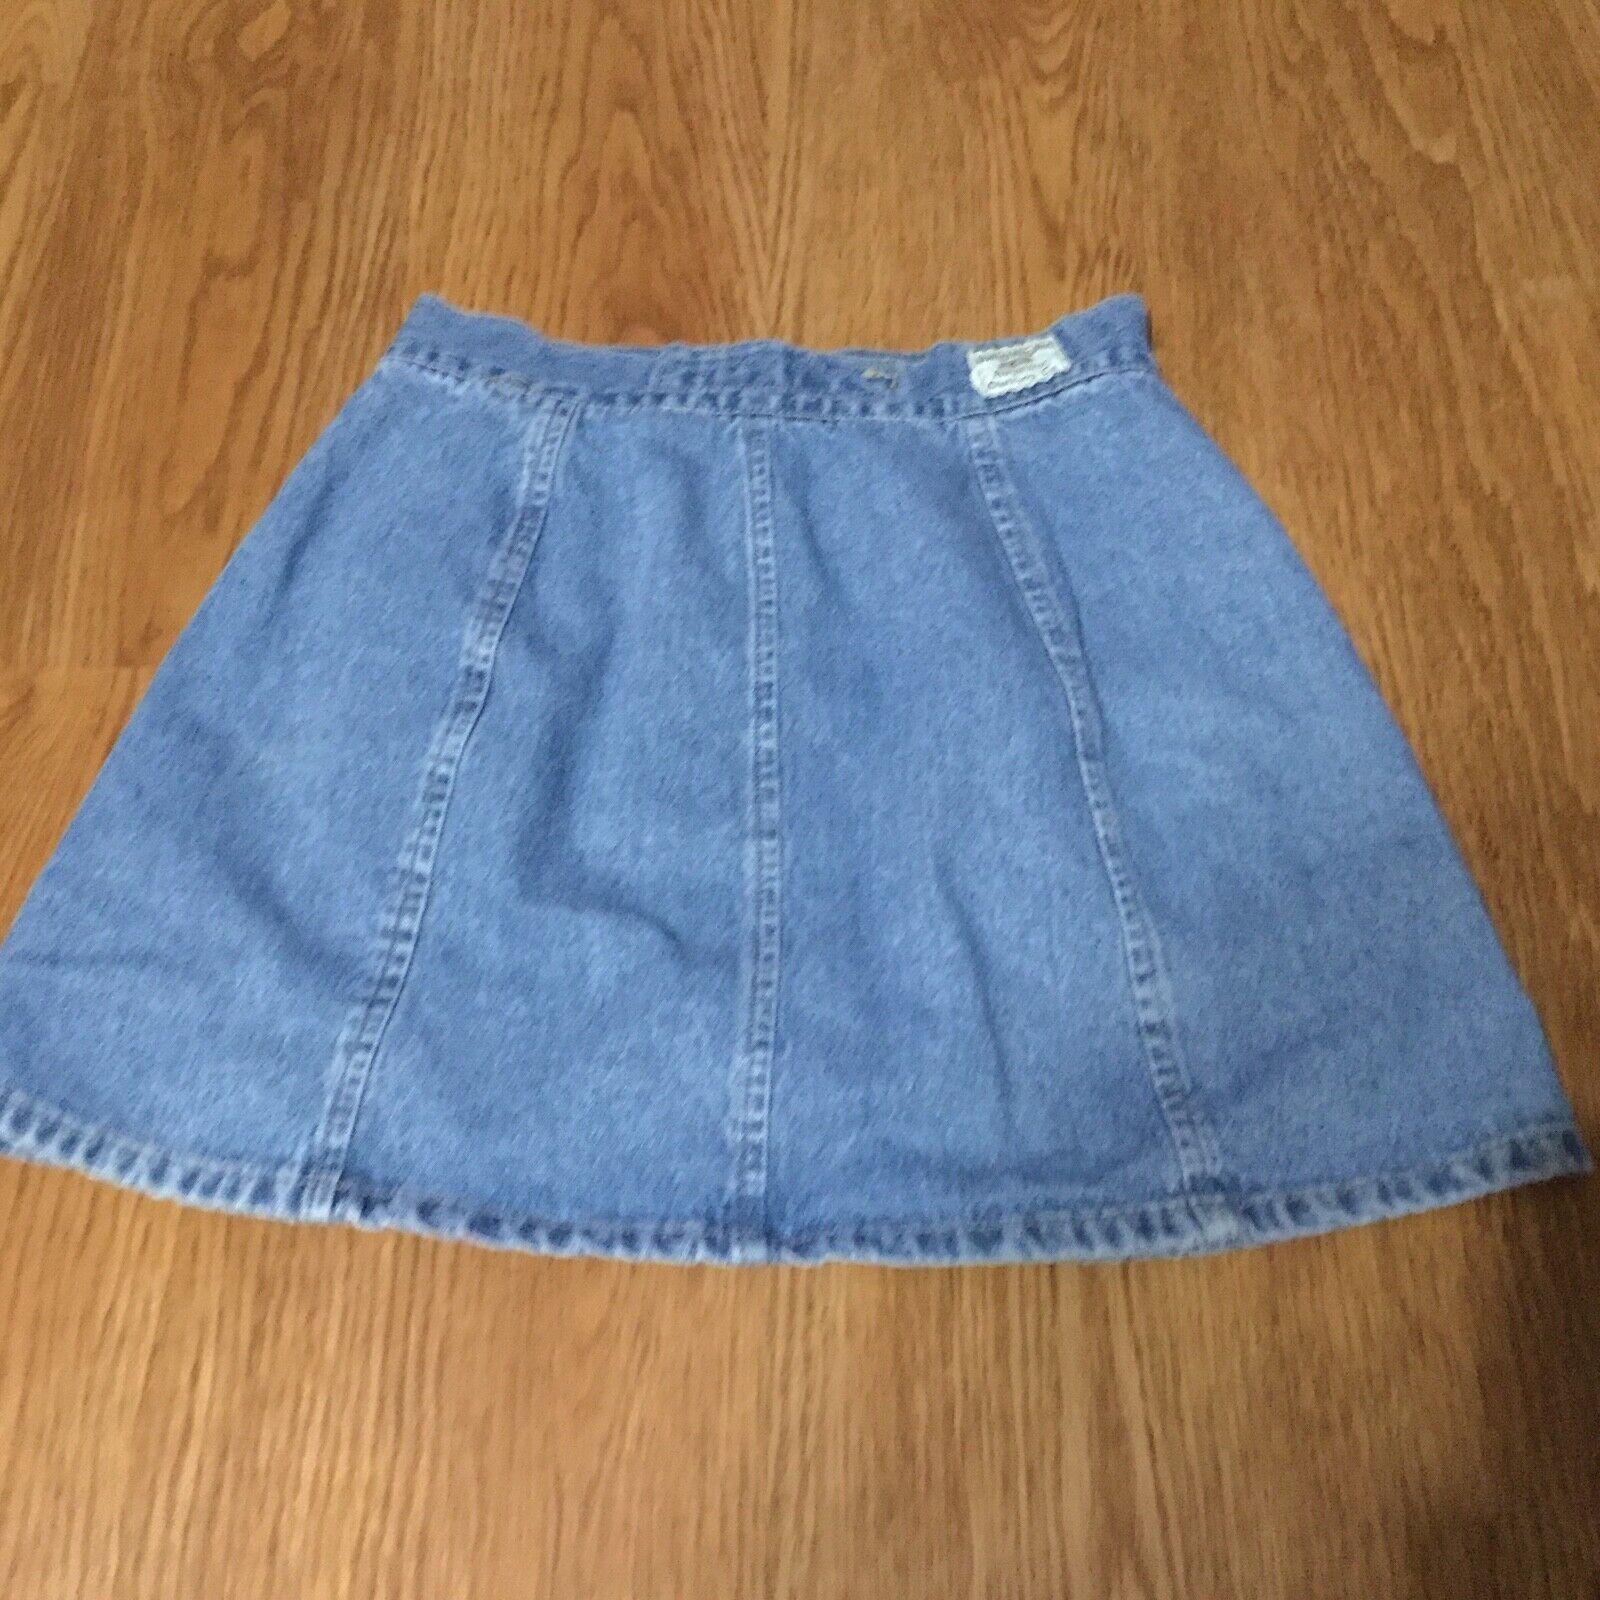 Vintage Unionbay Denim Mini Skirt Juniors Size 3 … - image 2